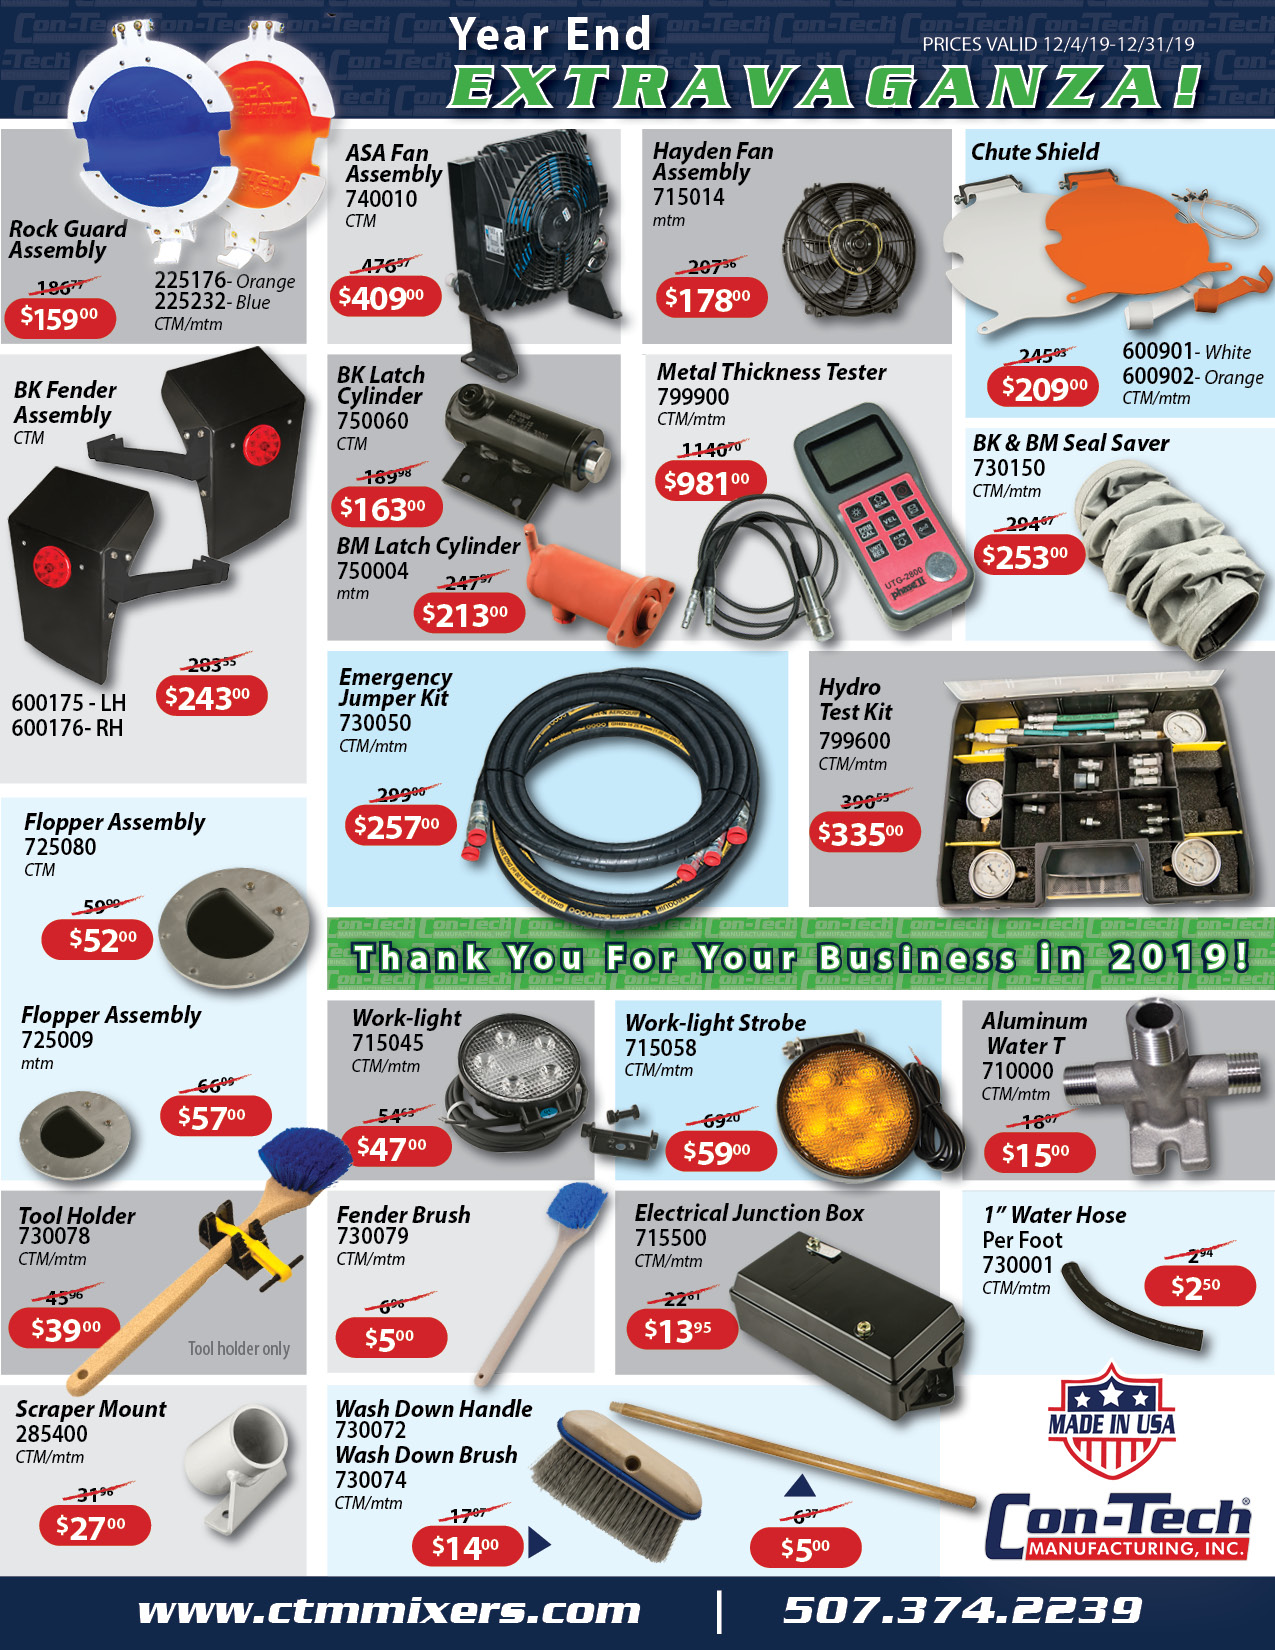 con-tech-year-end-parts-flyer.jpg